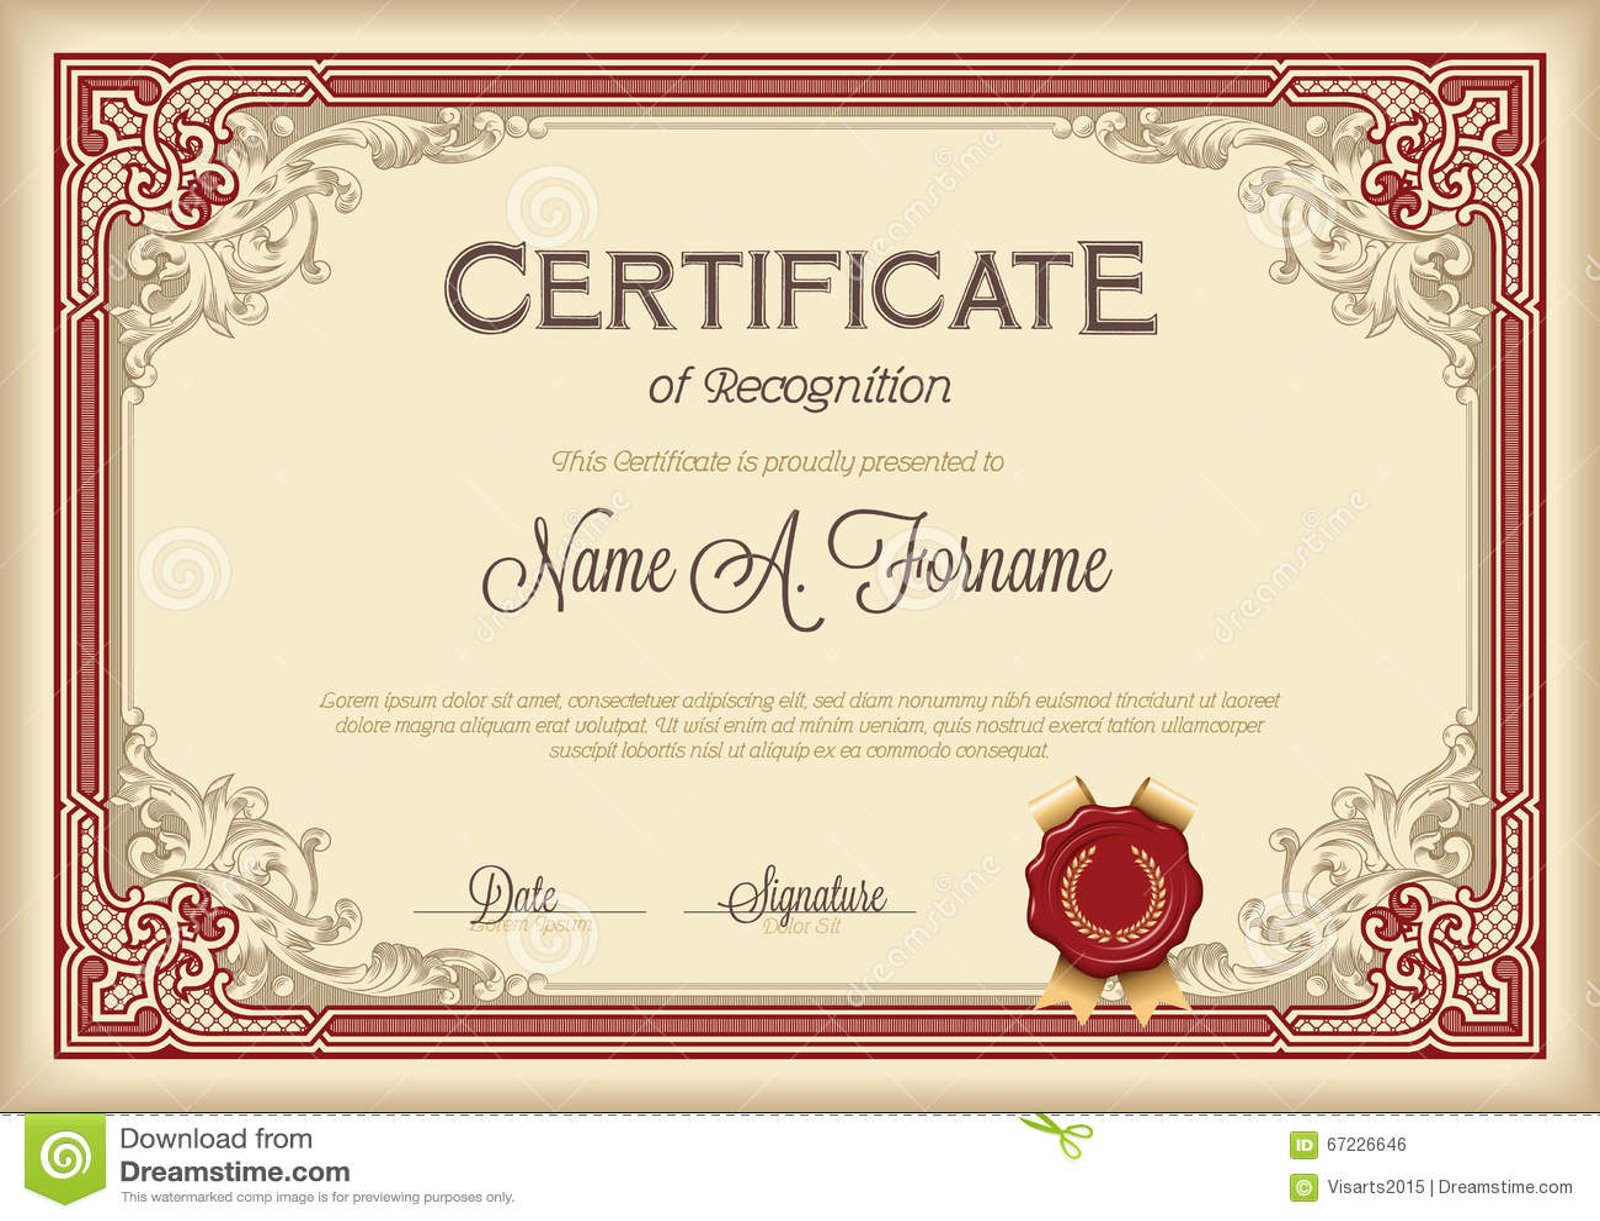 Certificate Of Recognition Vintage Floral Frame. Stock Vector - Image ...